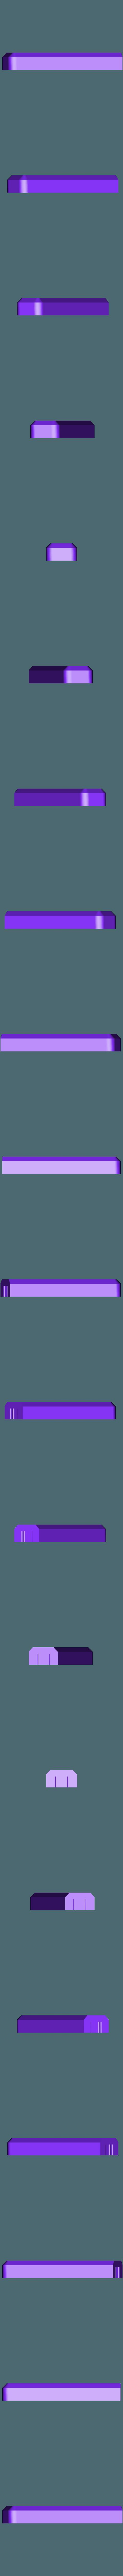 Base-left, Avengers Logo.STL Download free STL file Avengers Rotating Logo • 3D printing template, potentprintables